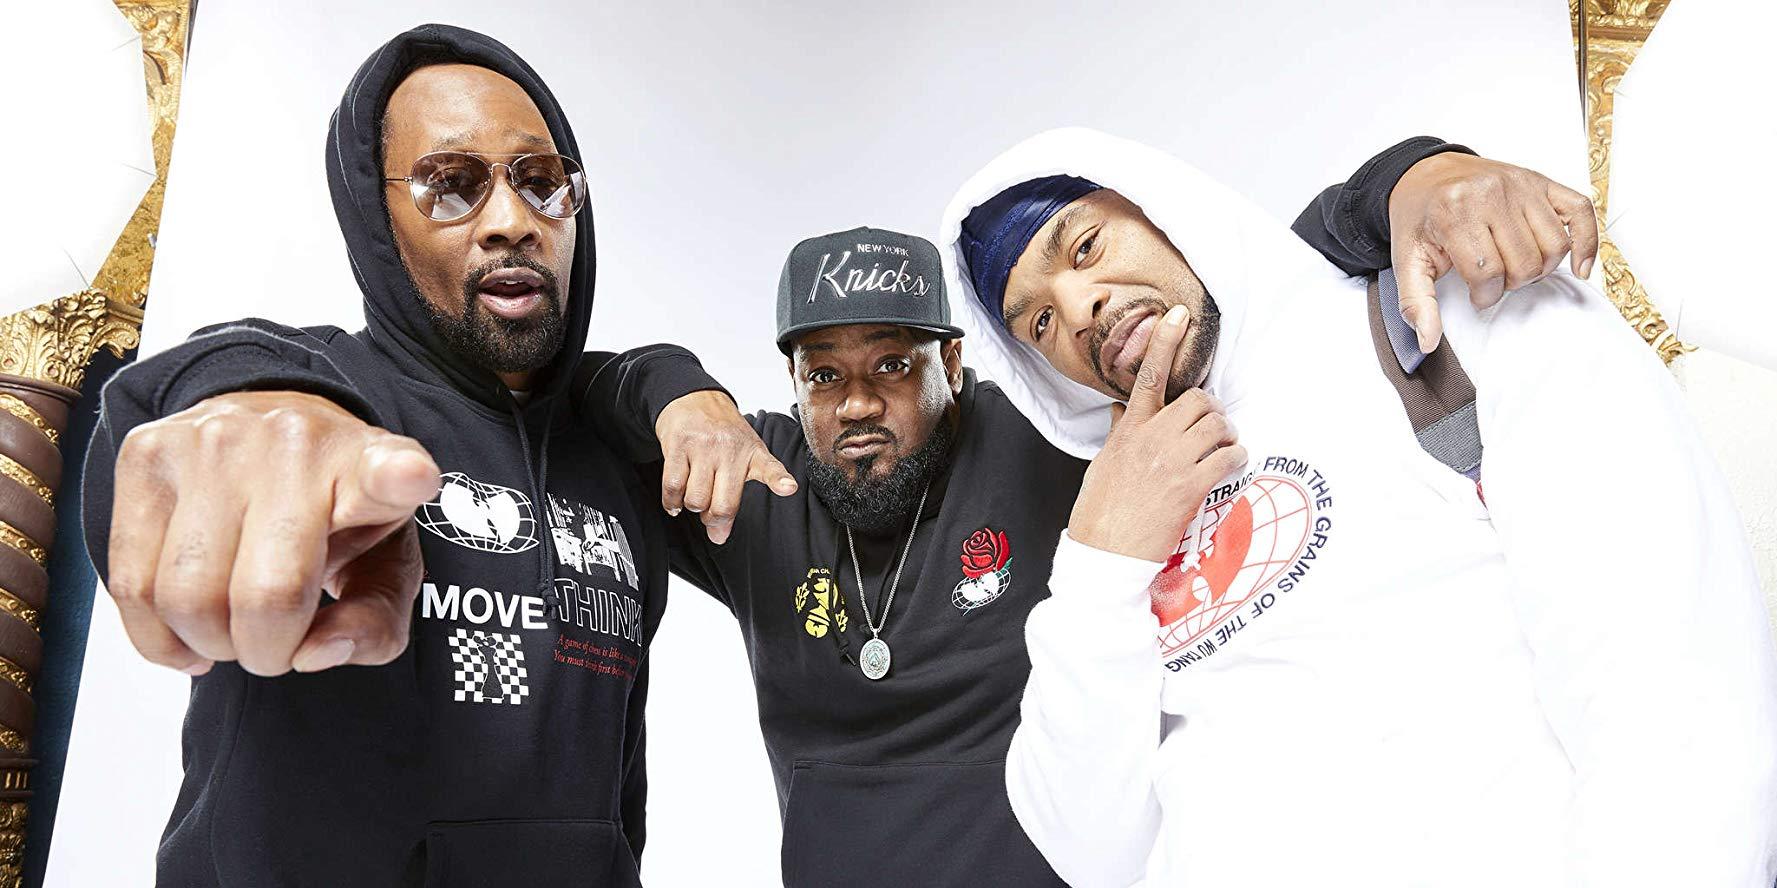 Wu-Tang Clan: Of Mics and Men - Season 1